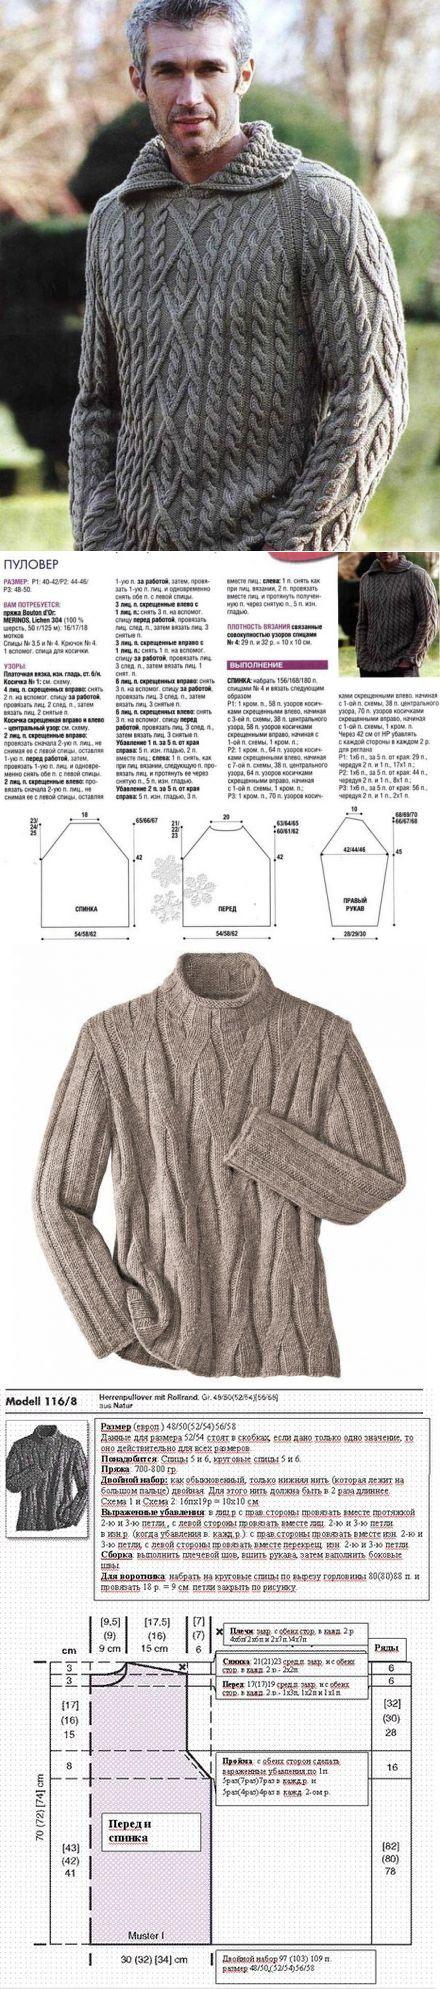 Love nr 2 sweater.